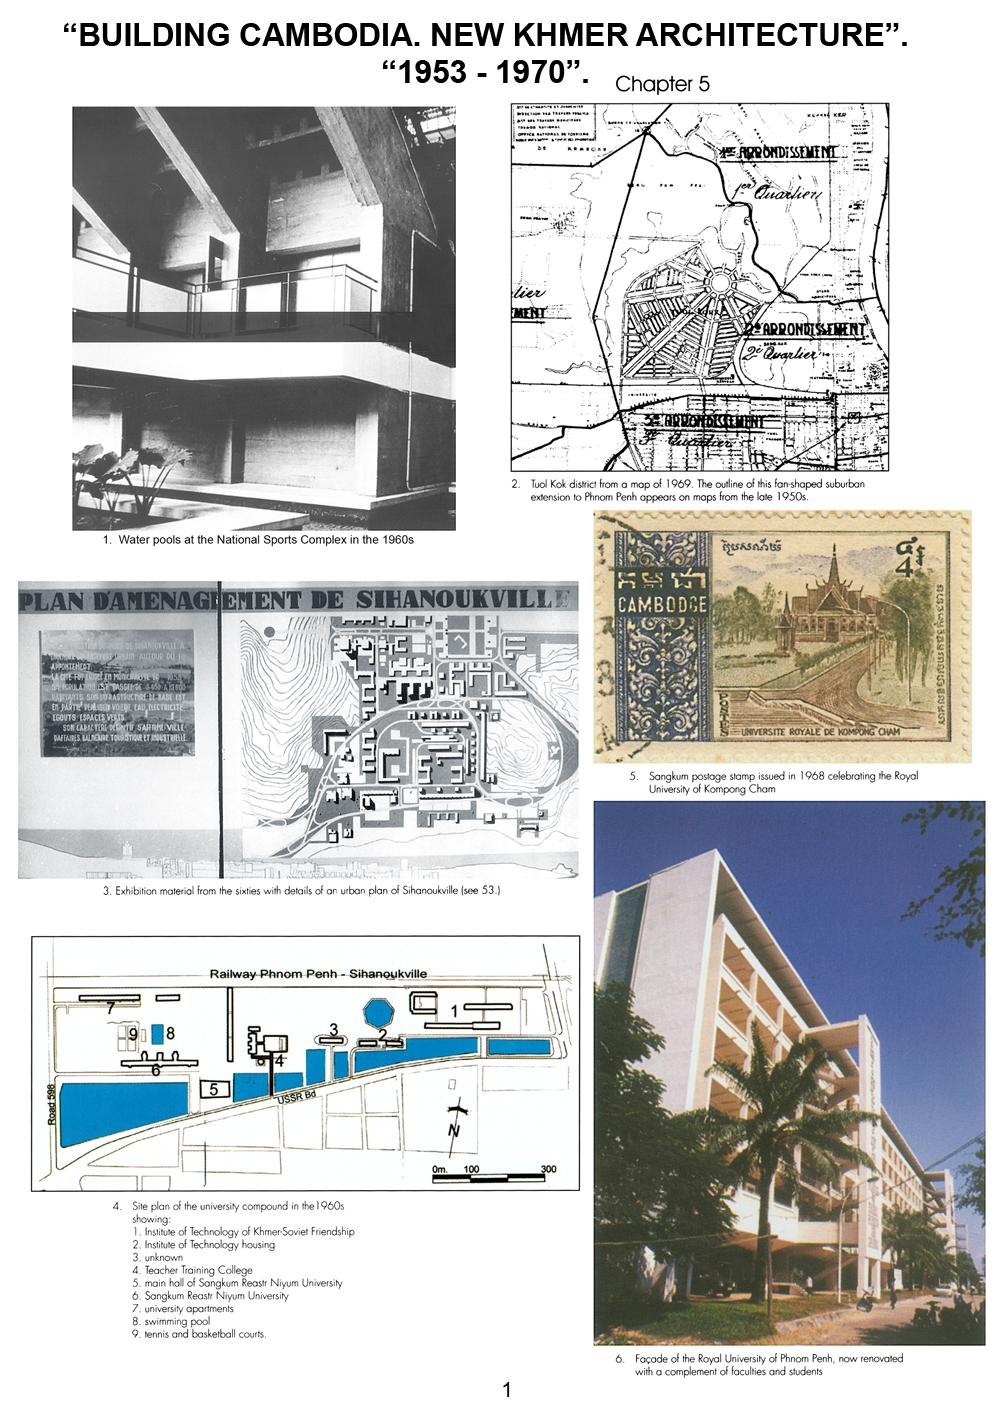 All/document/Documents/BuildingCambodia/BuildingCambodia/id671/photo001.jpg